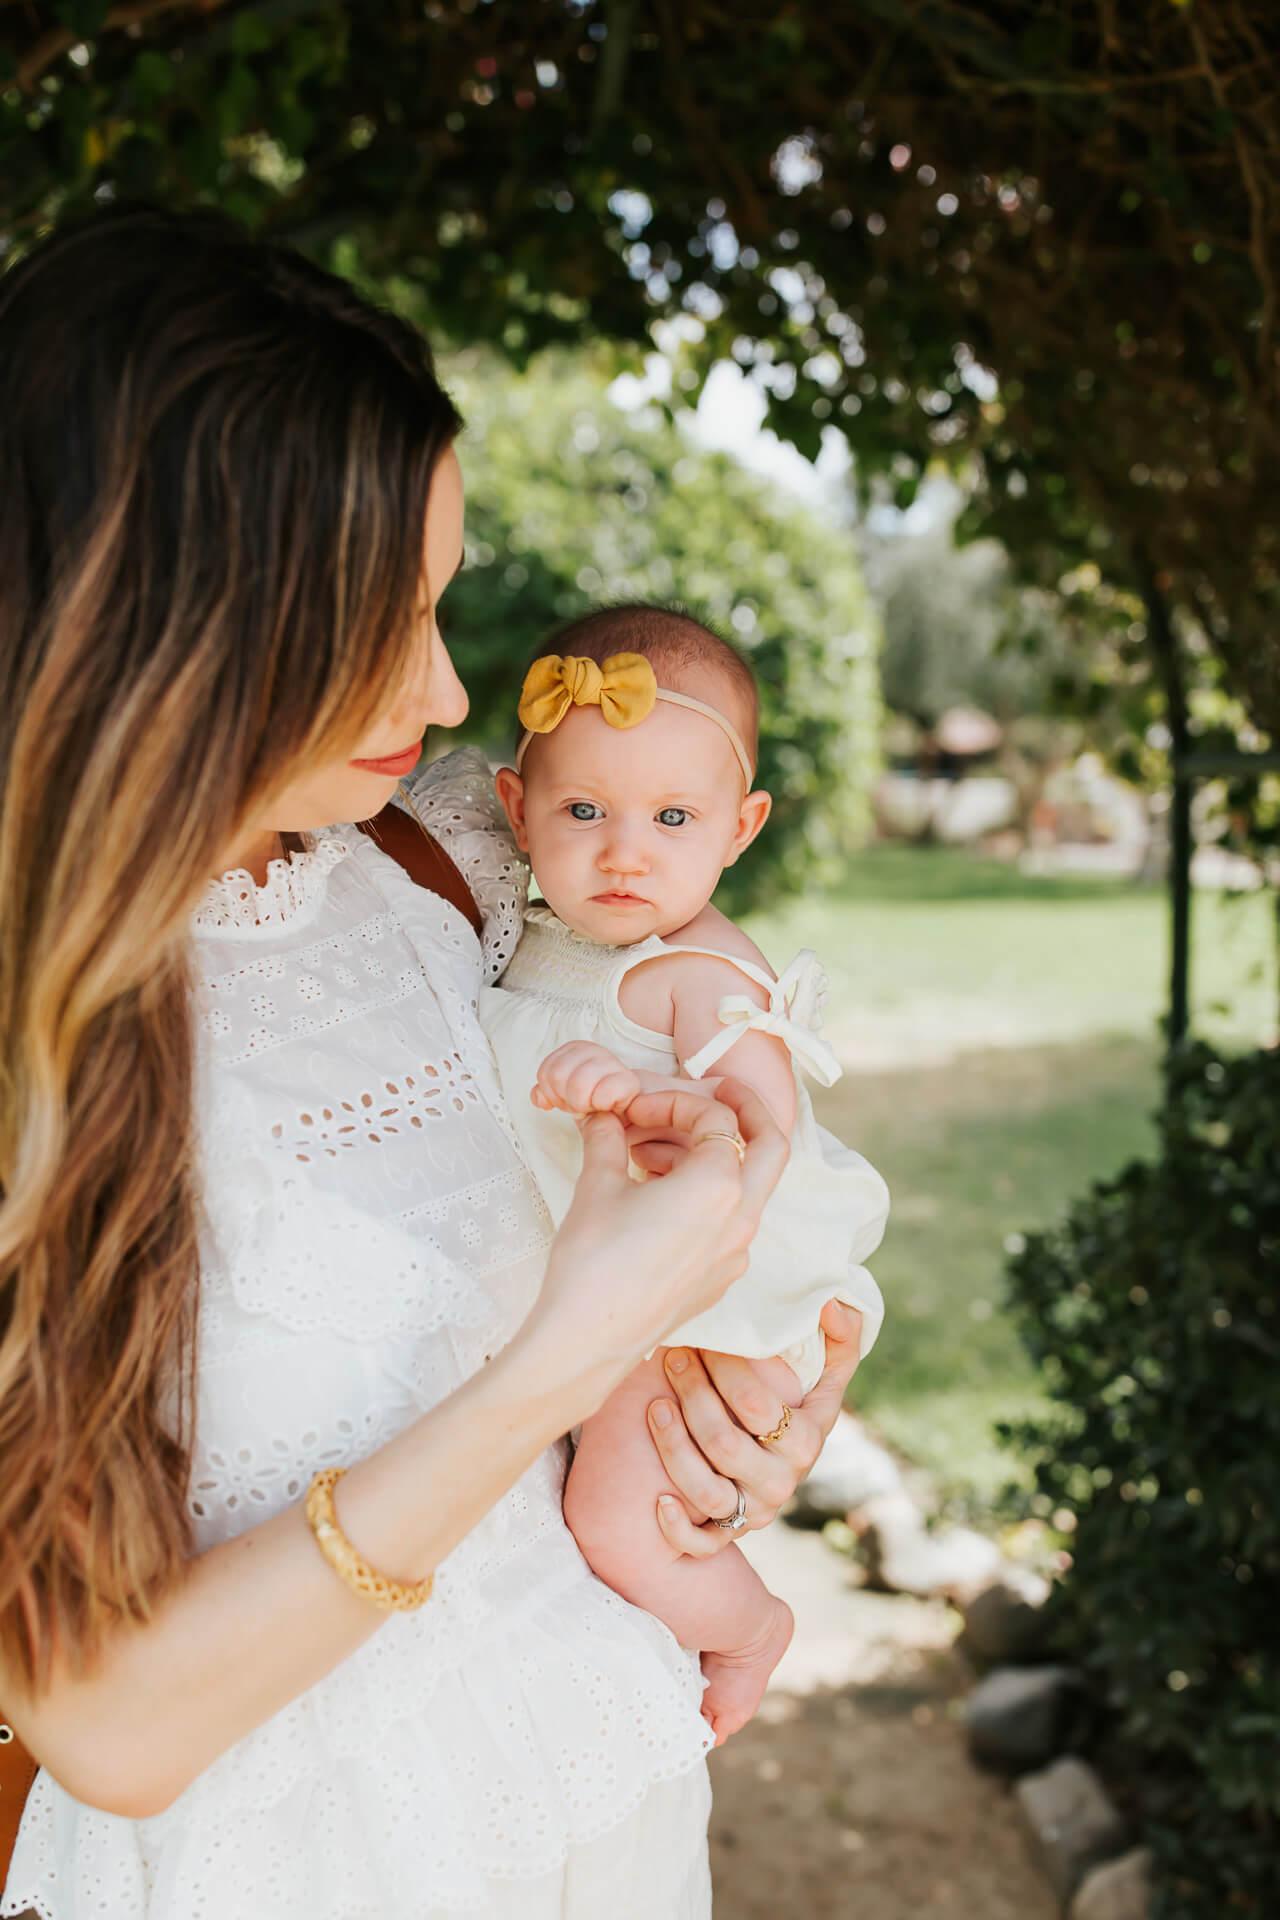 Baby organization tips! - M Loves M @marmar